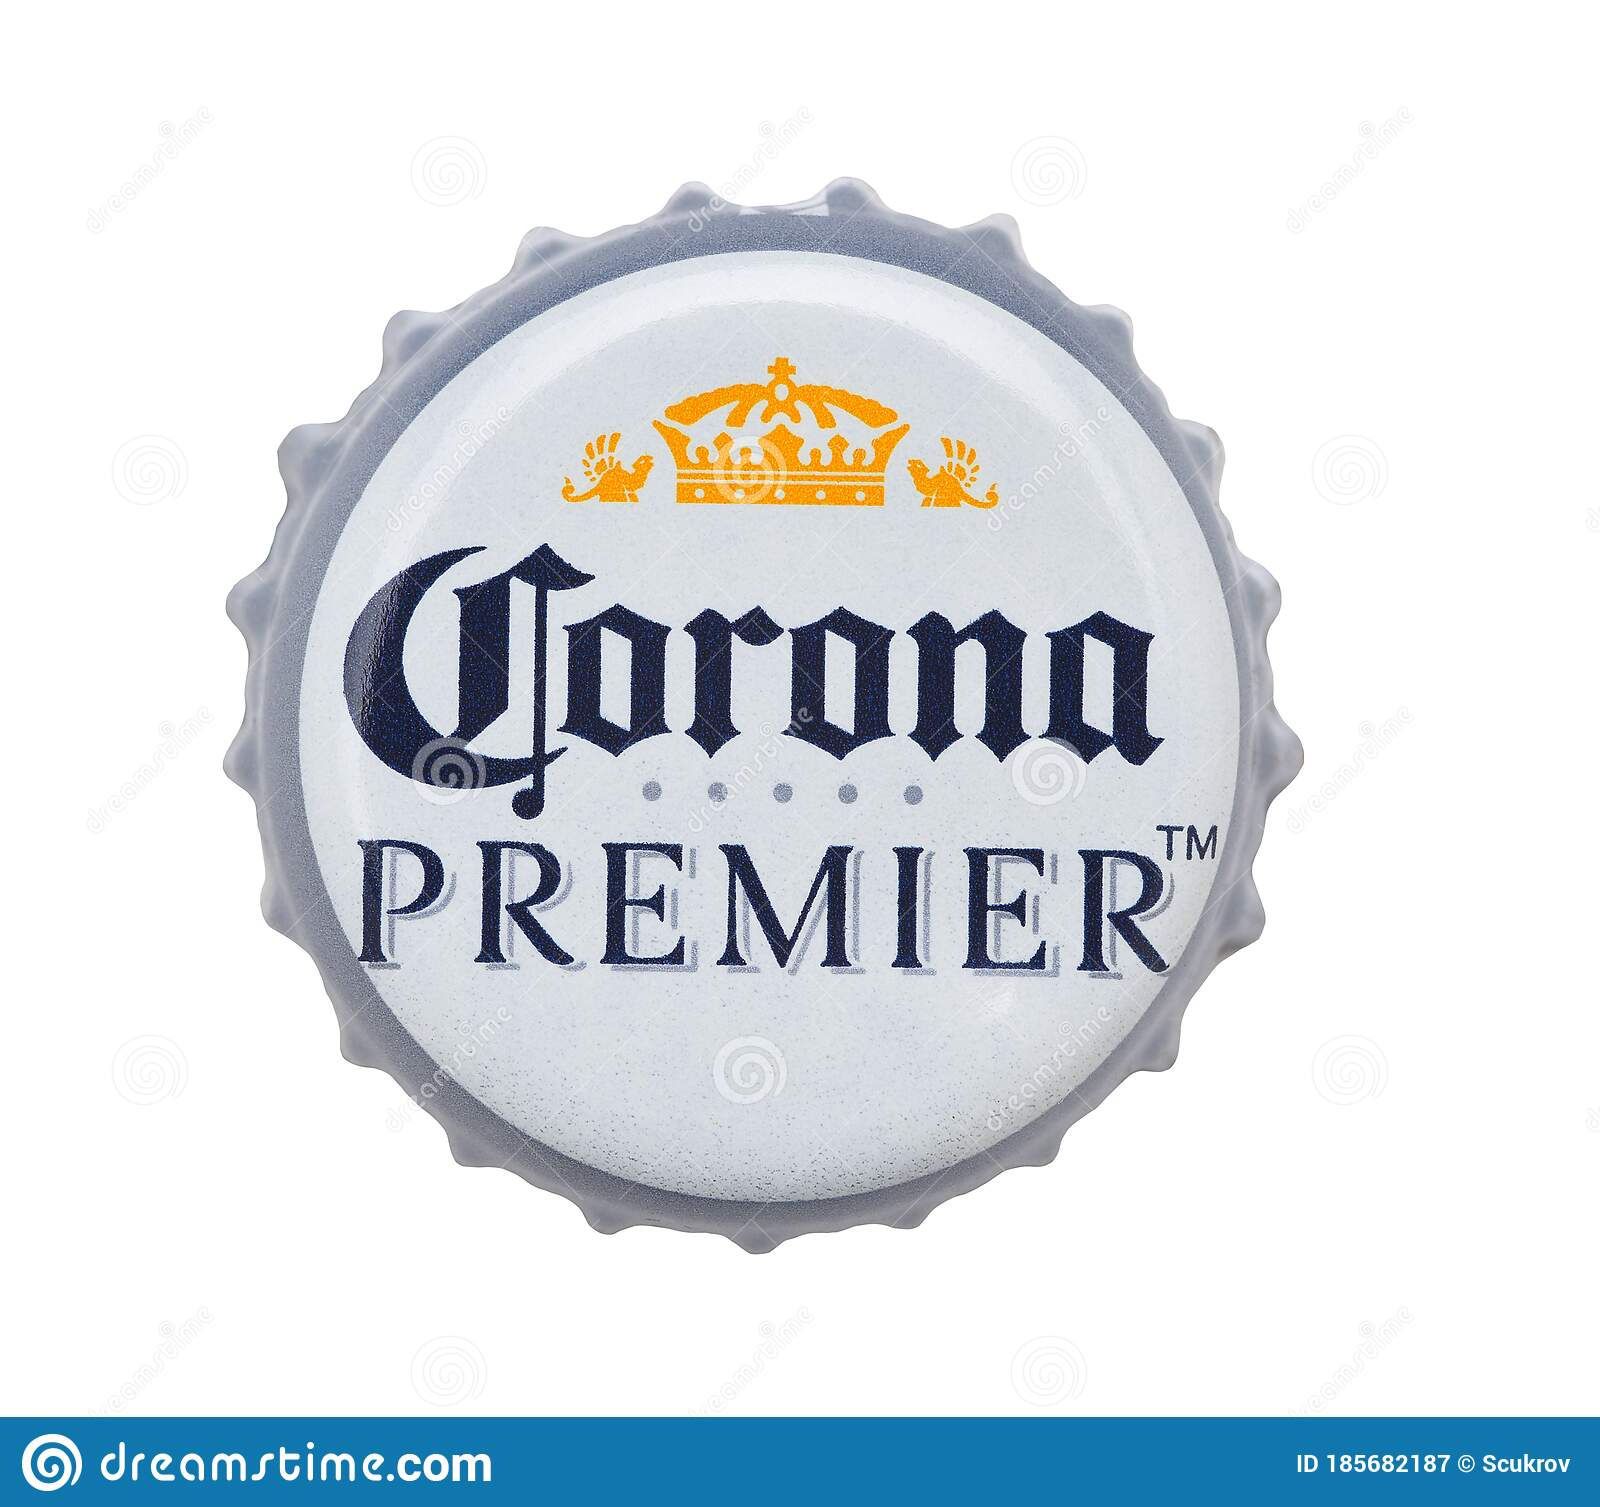 53 Corona Premier Photos Free Royalty Free Stock Photos From Dreamstime